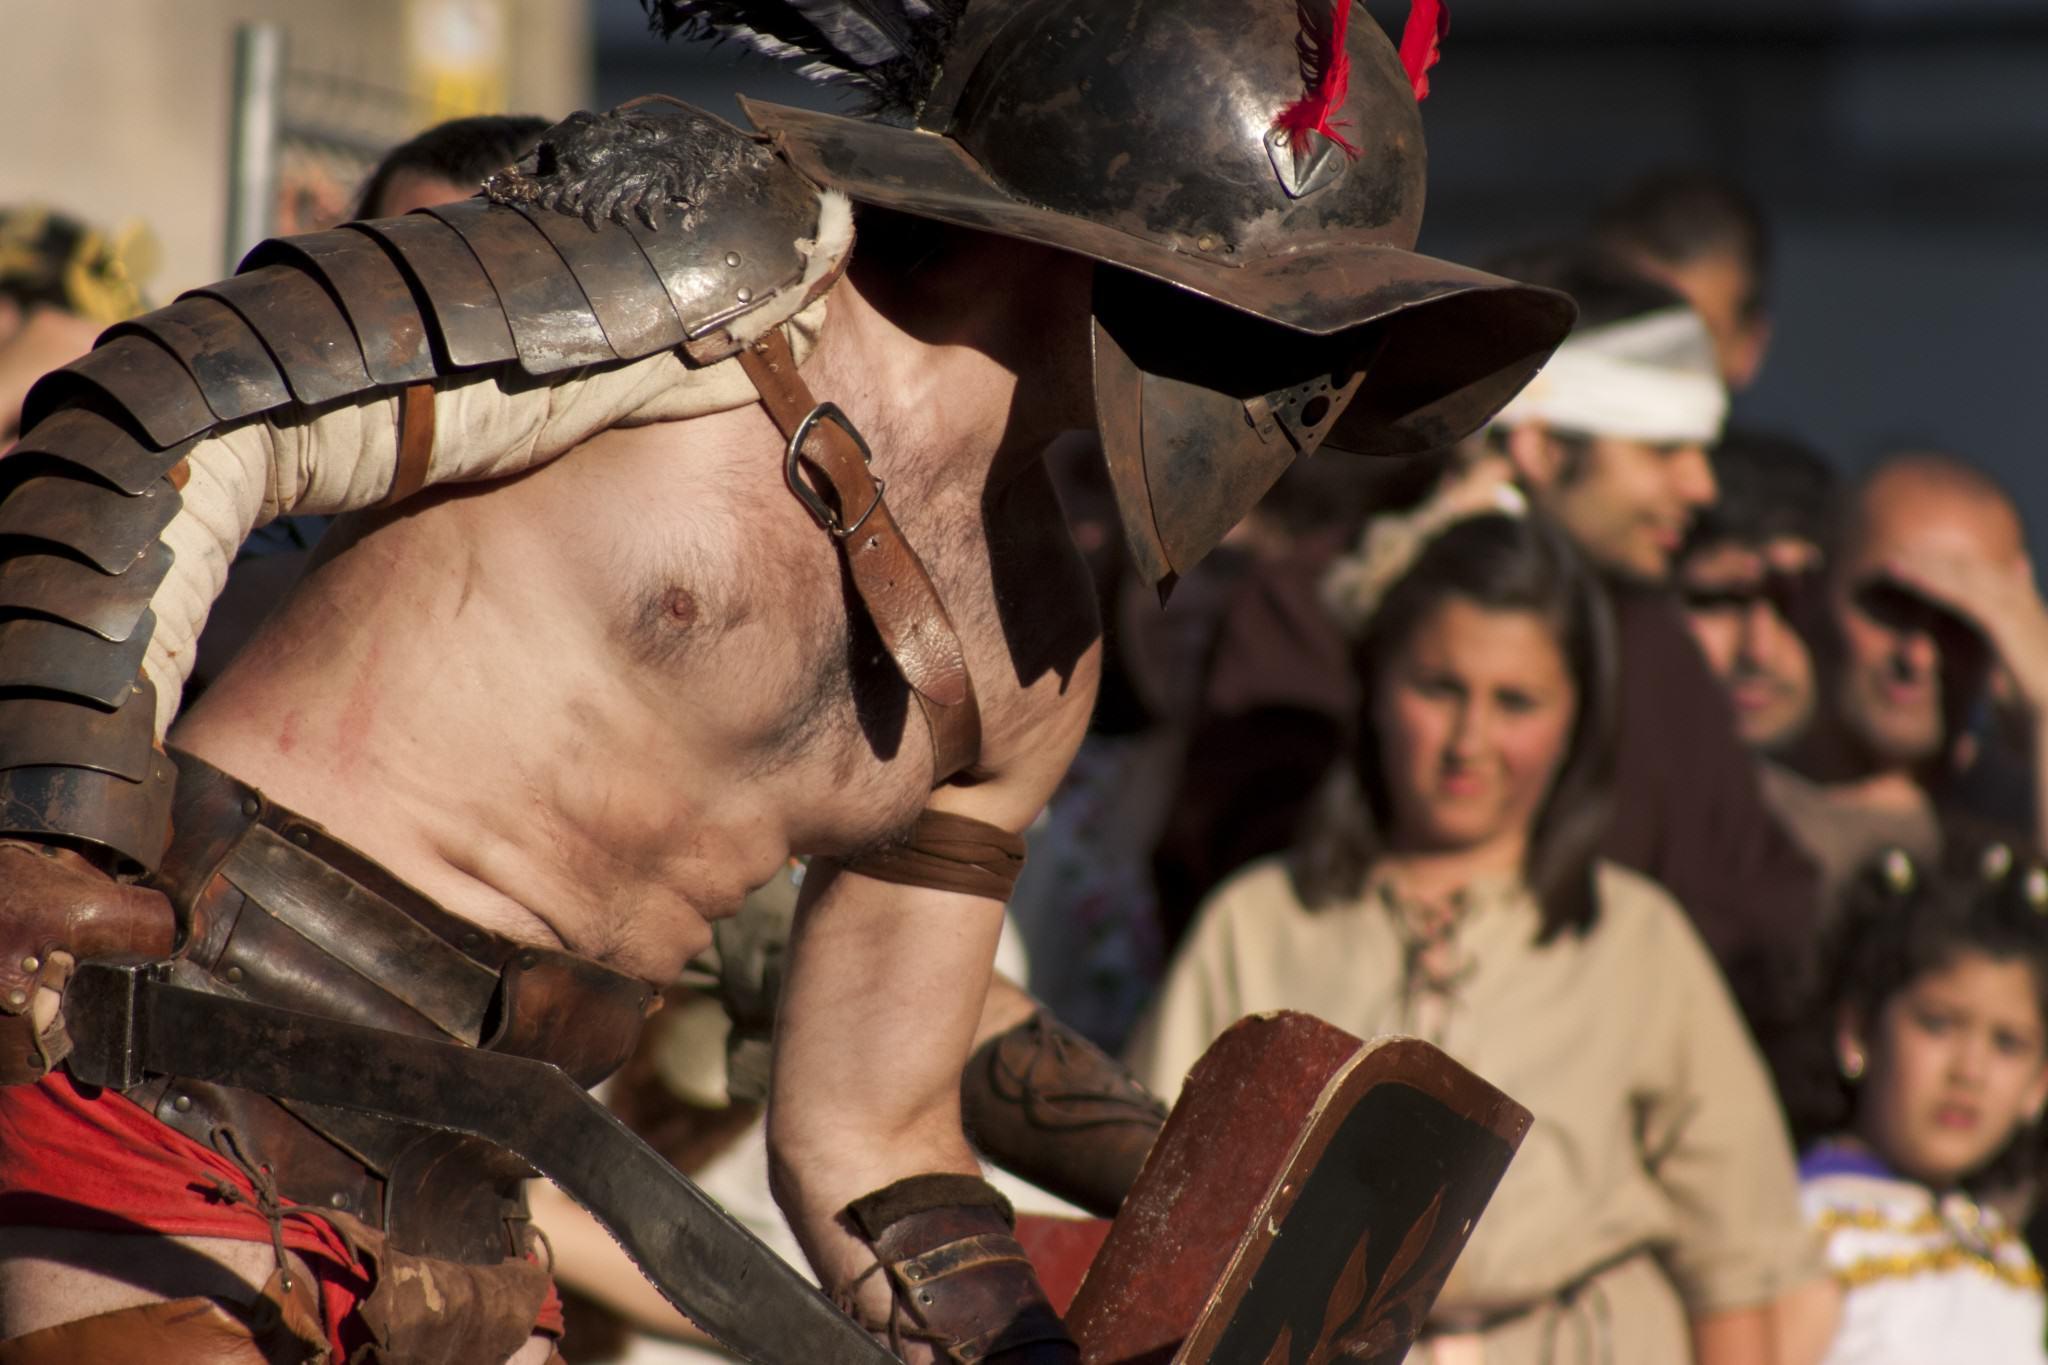 gladiator-1249010